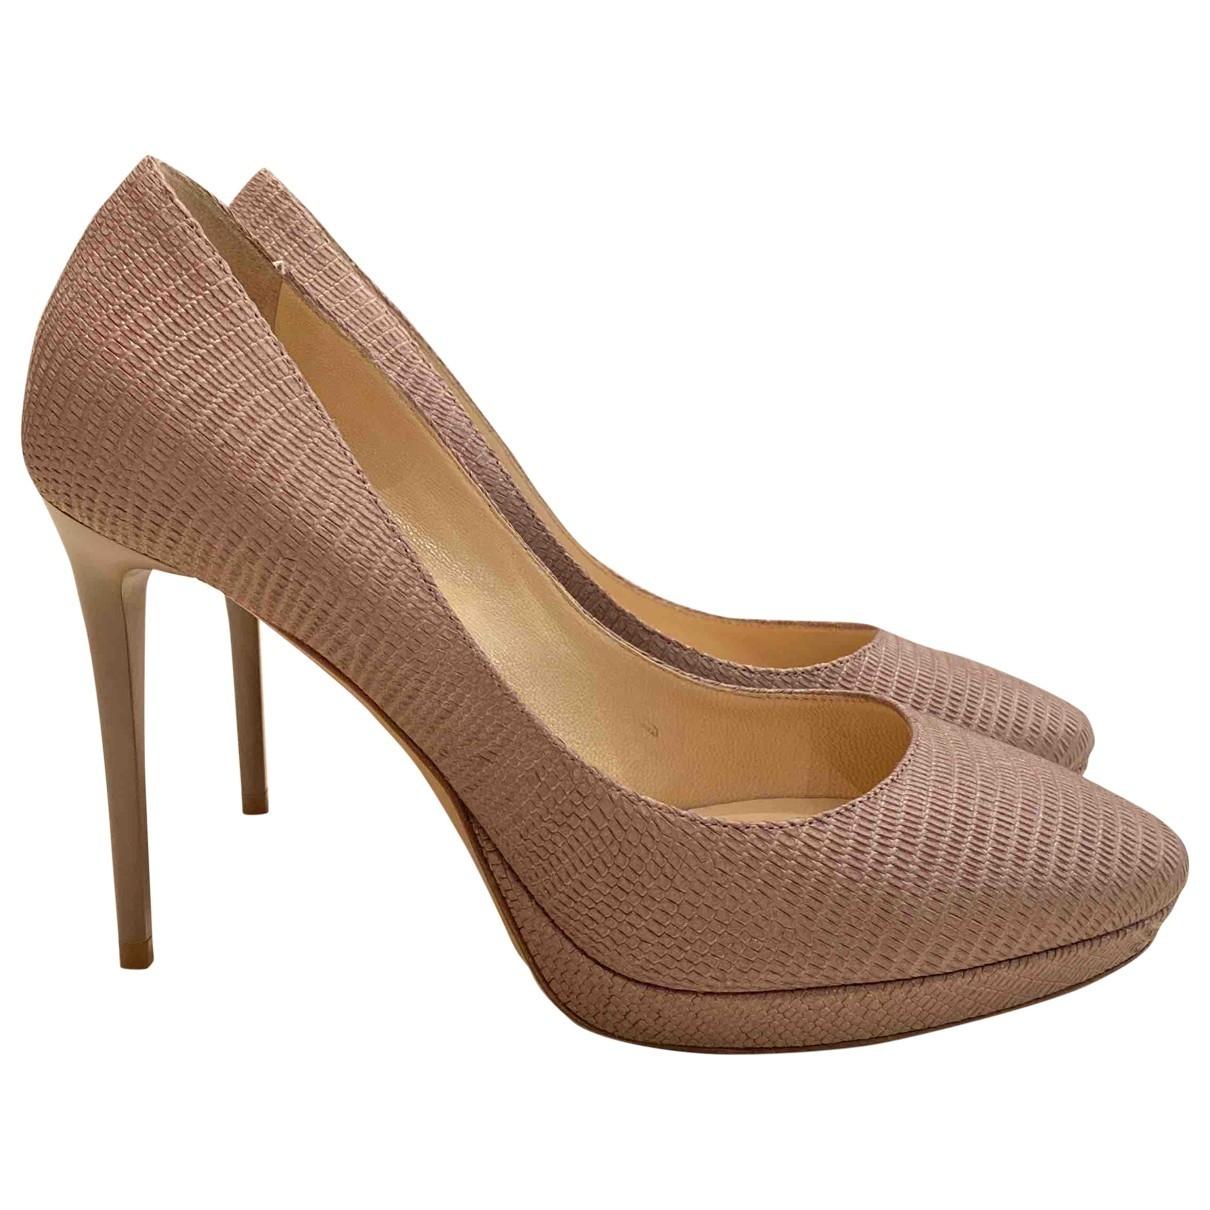 Jimmy Choo \N Beige Leather Heels for Women 37 EU